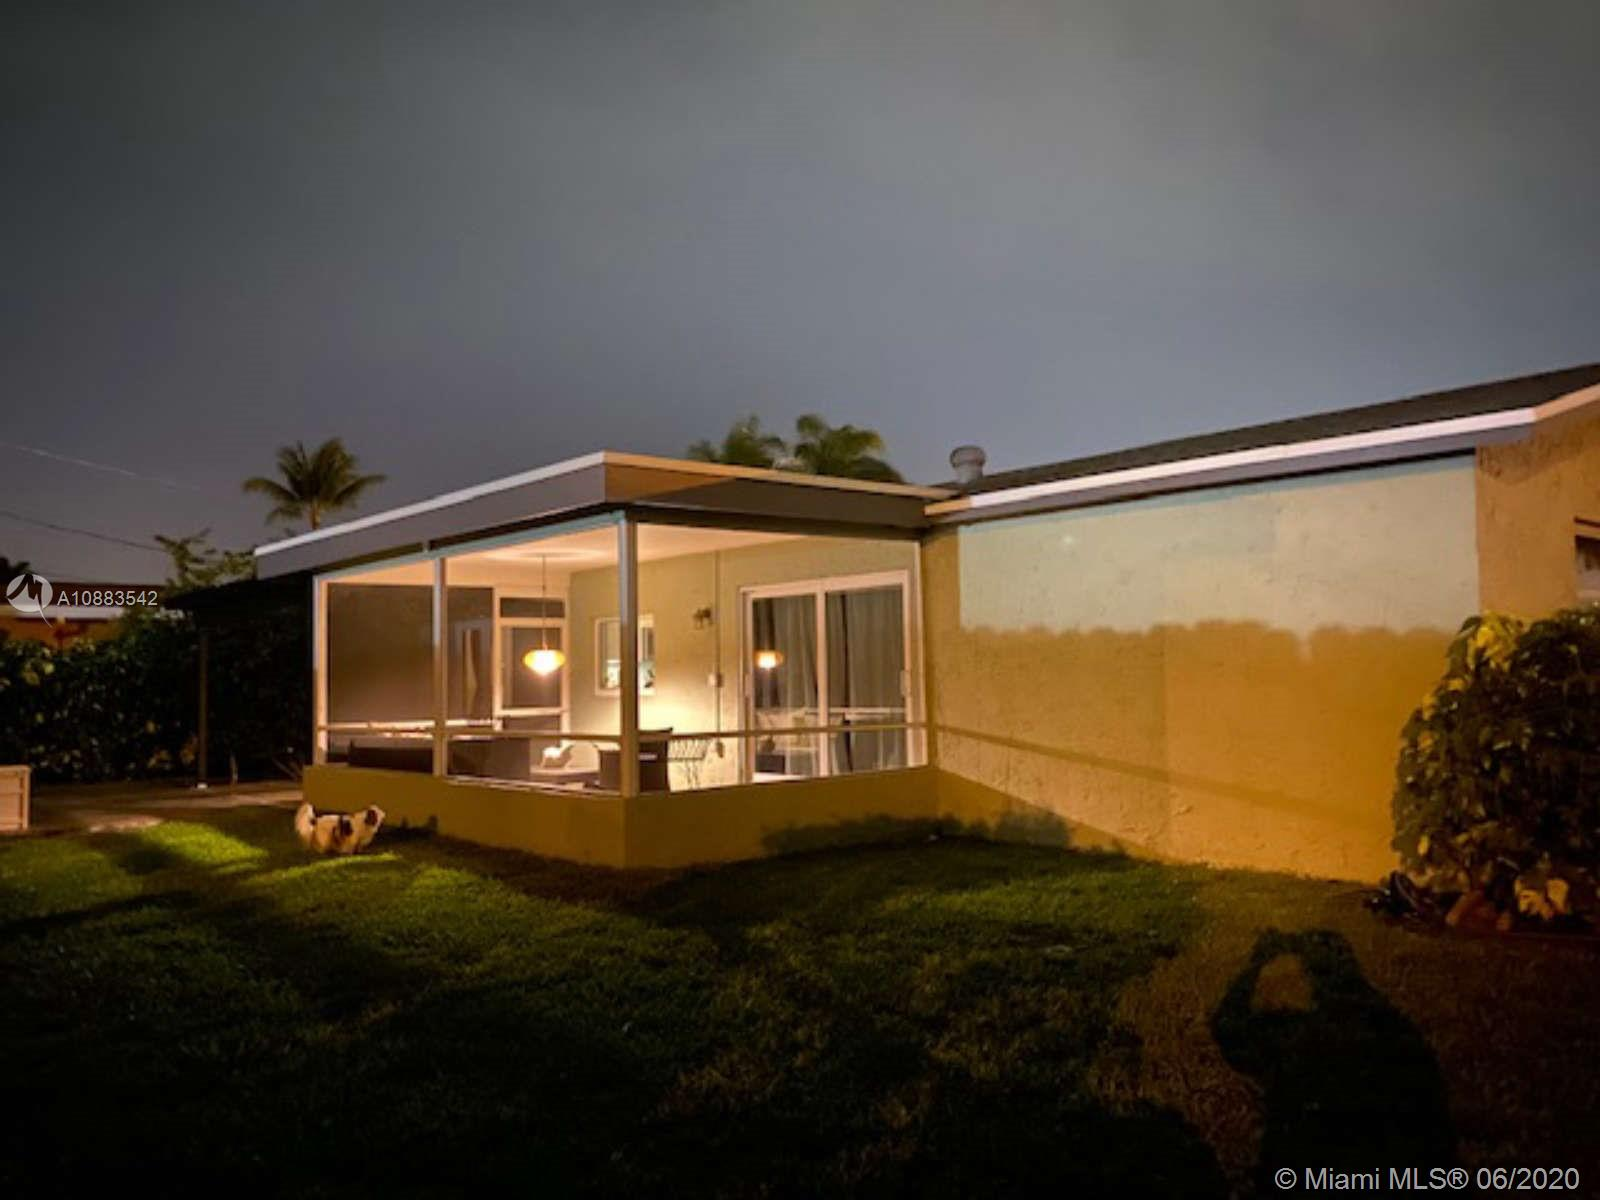 Sunrise Golf Village # - 11 - photo